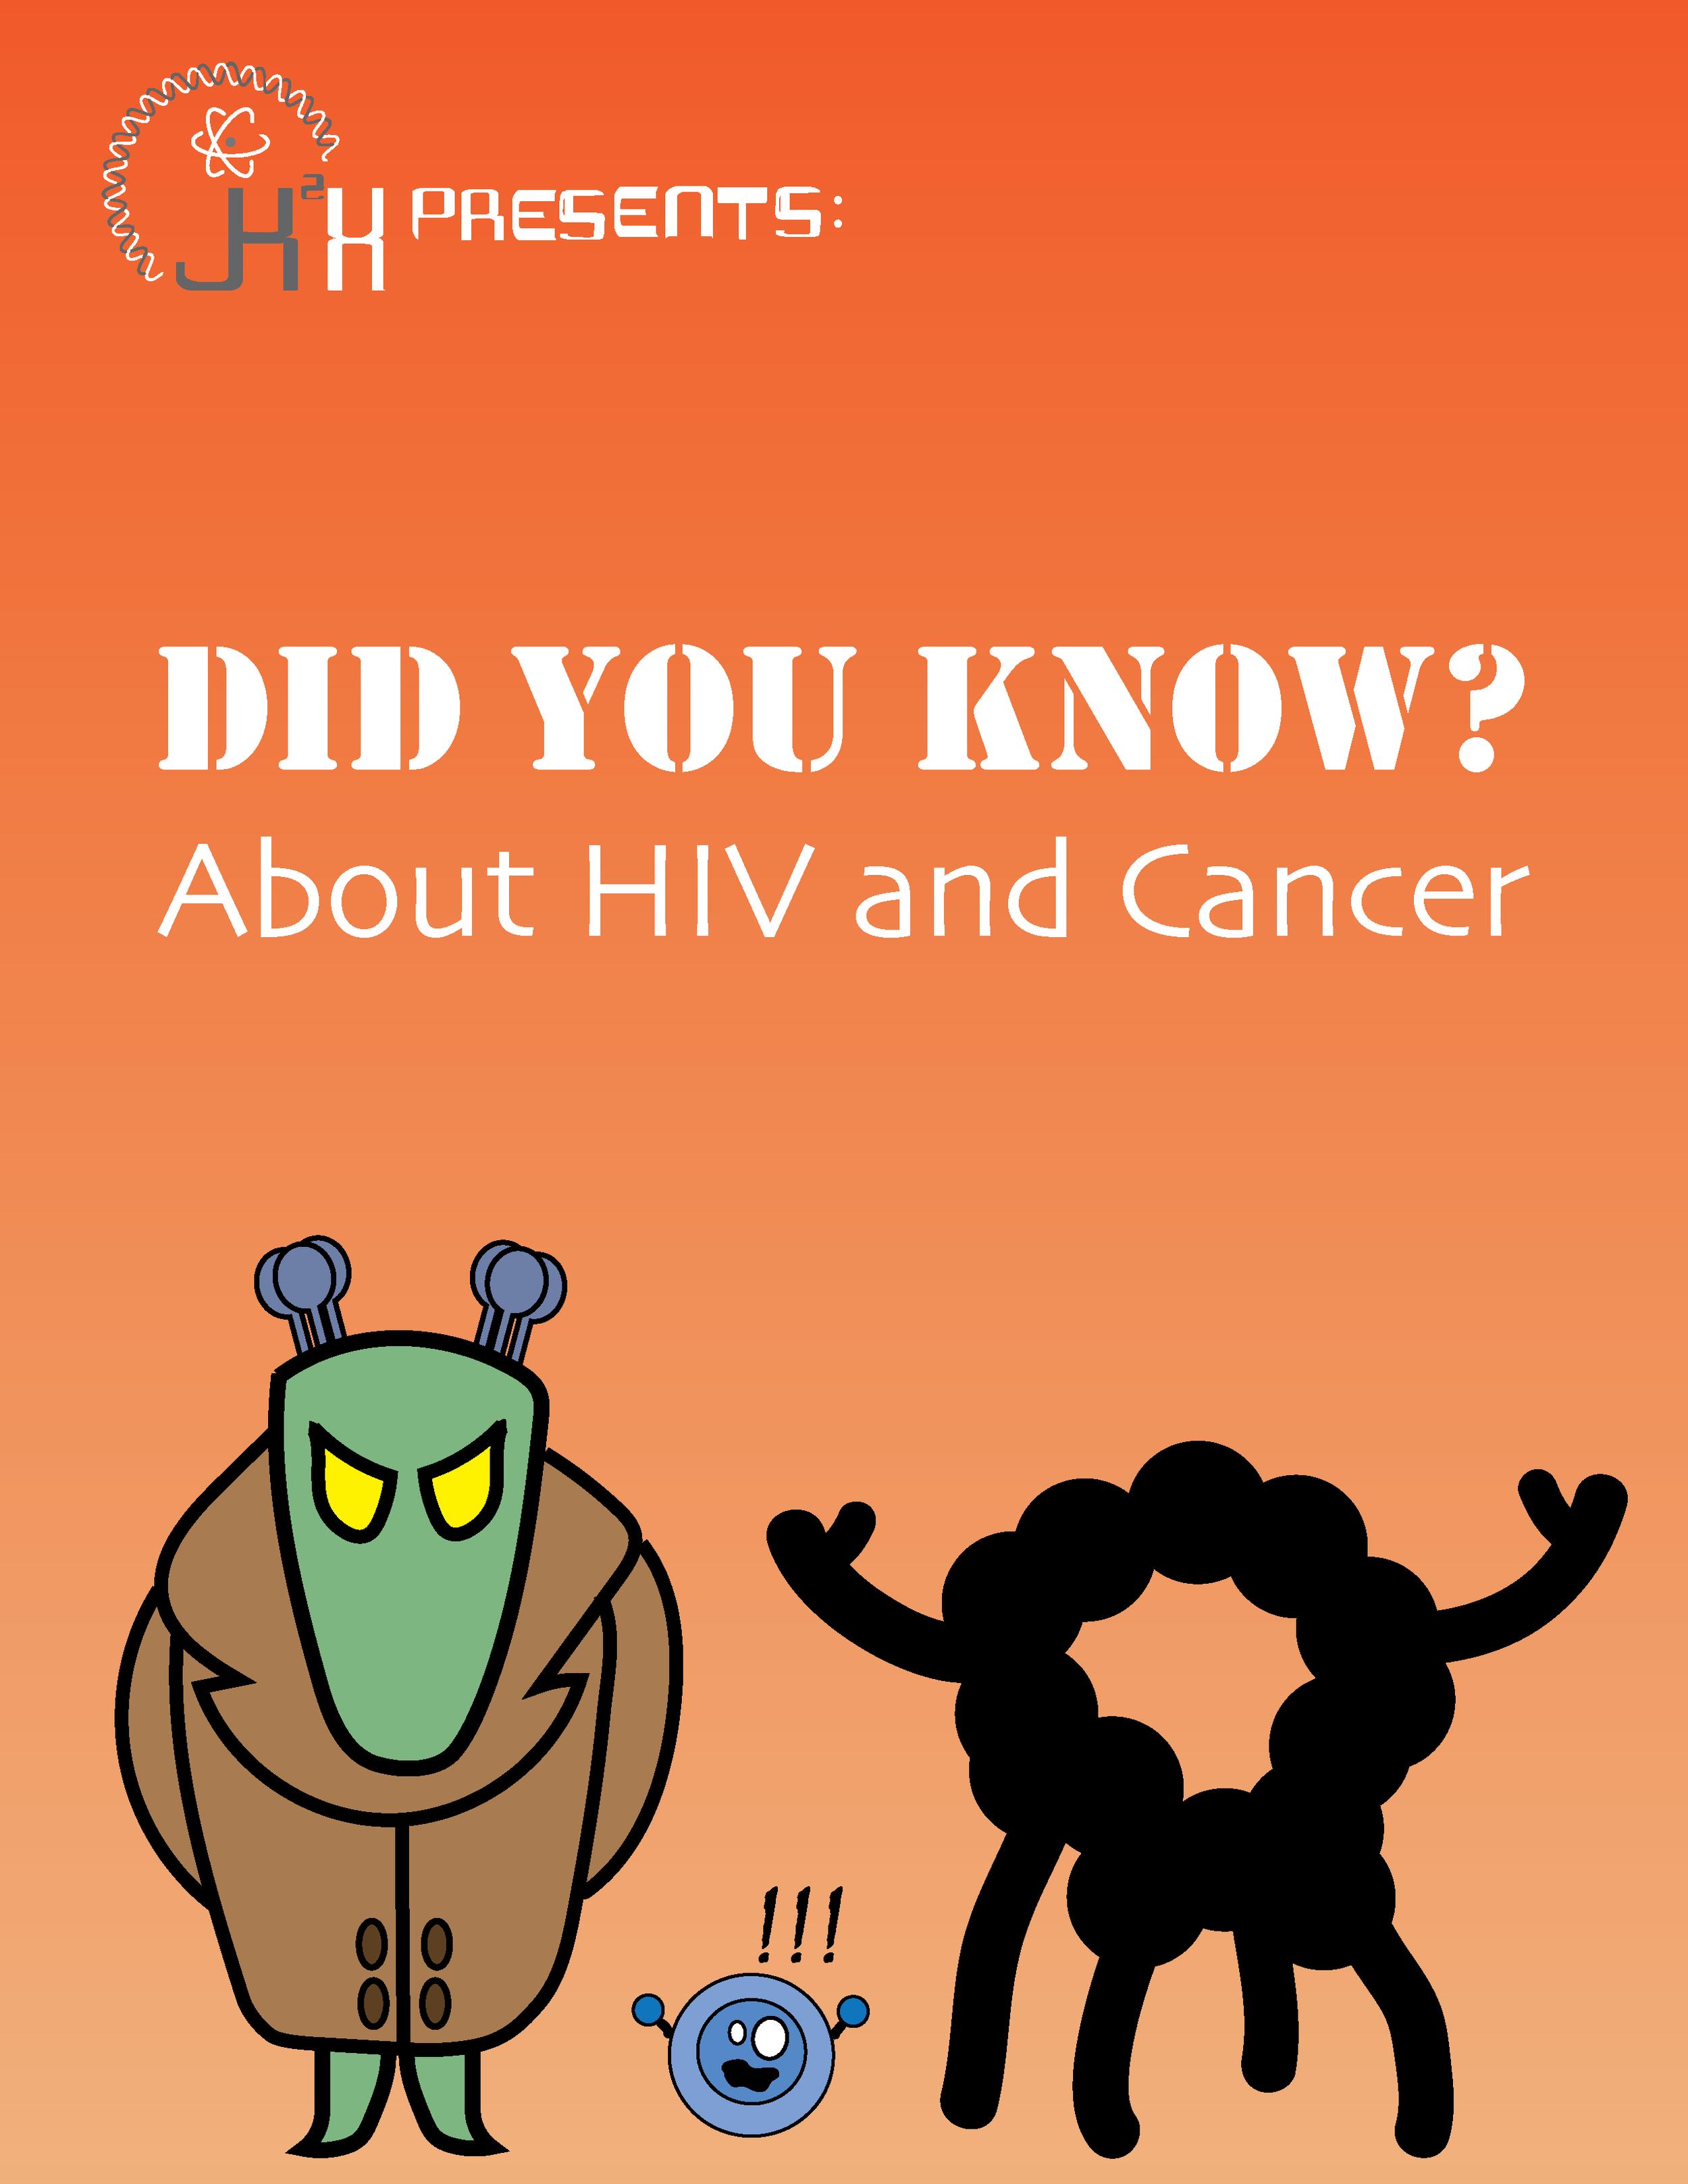 HIVandCancer_cover.png